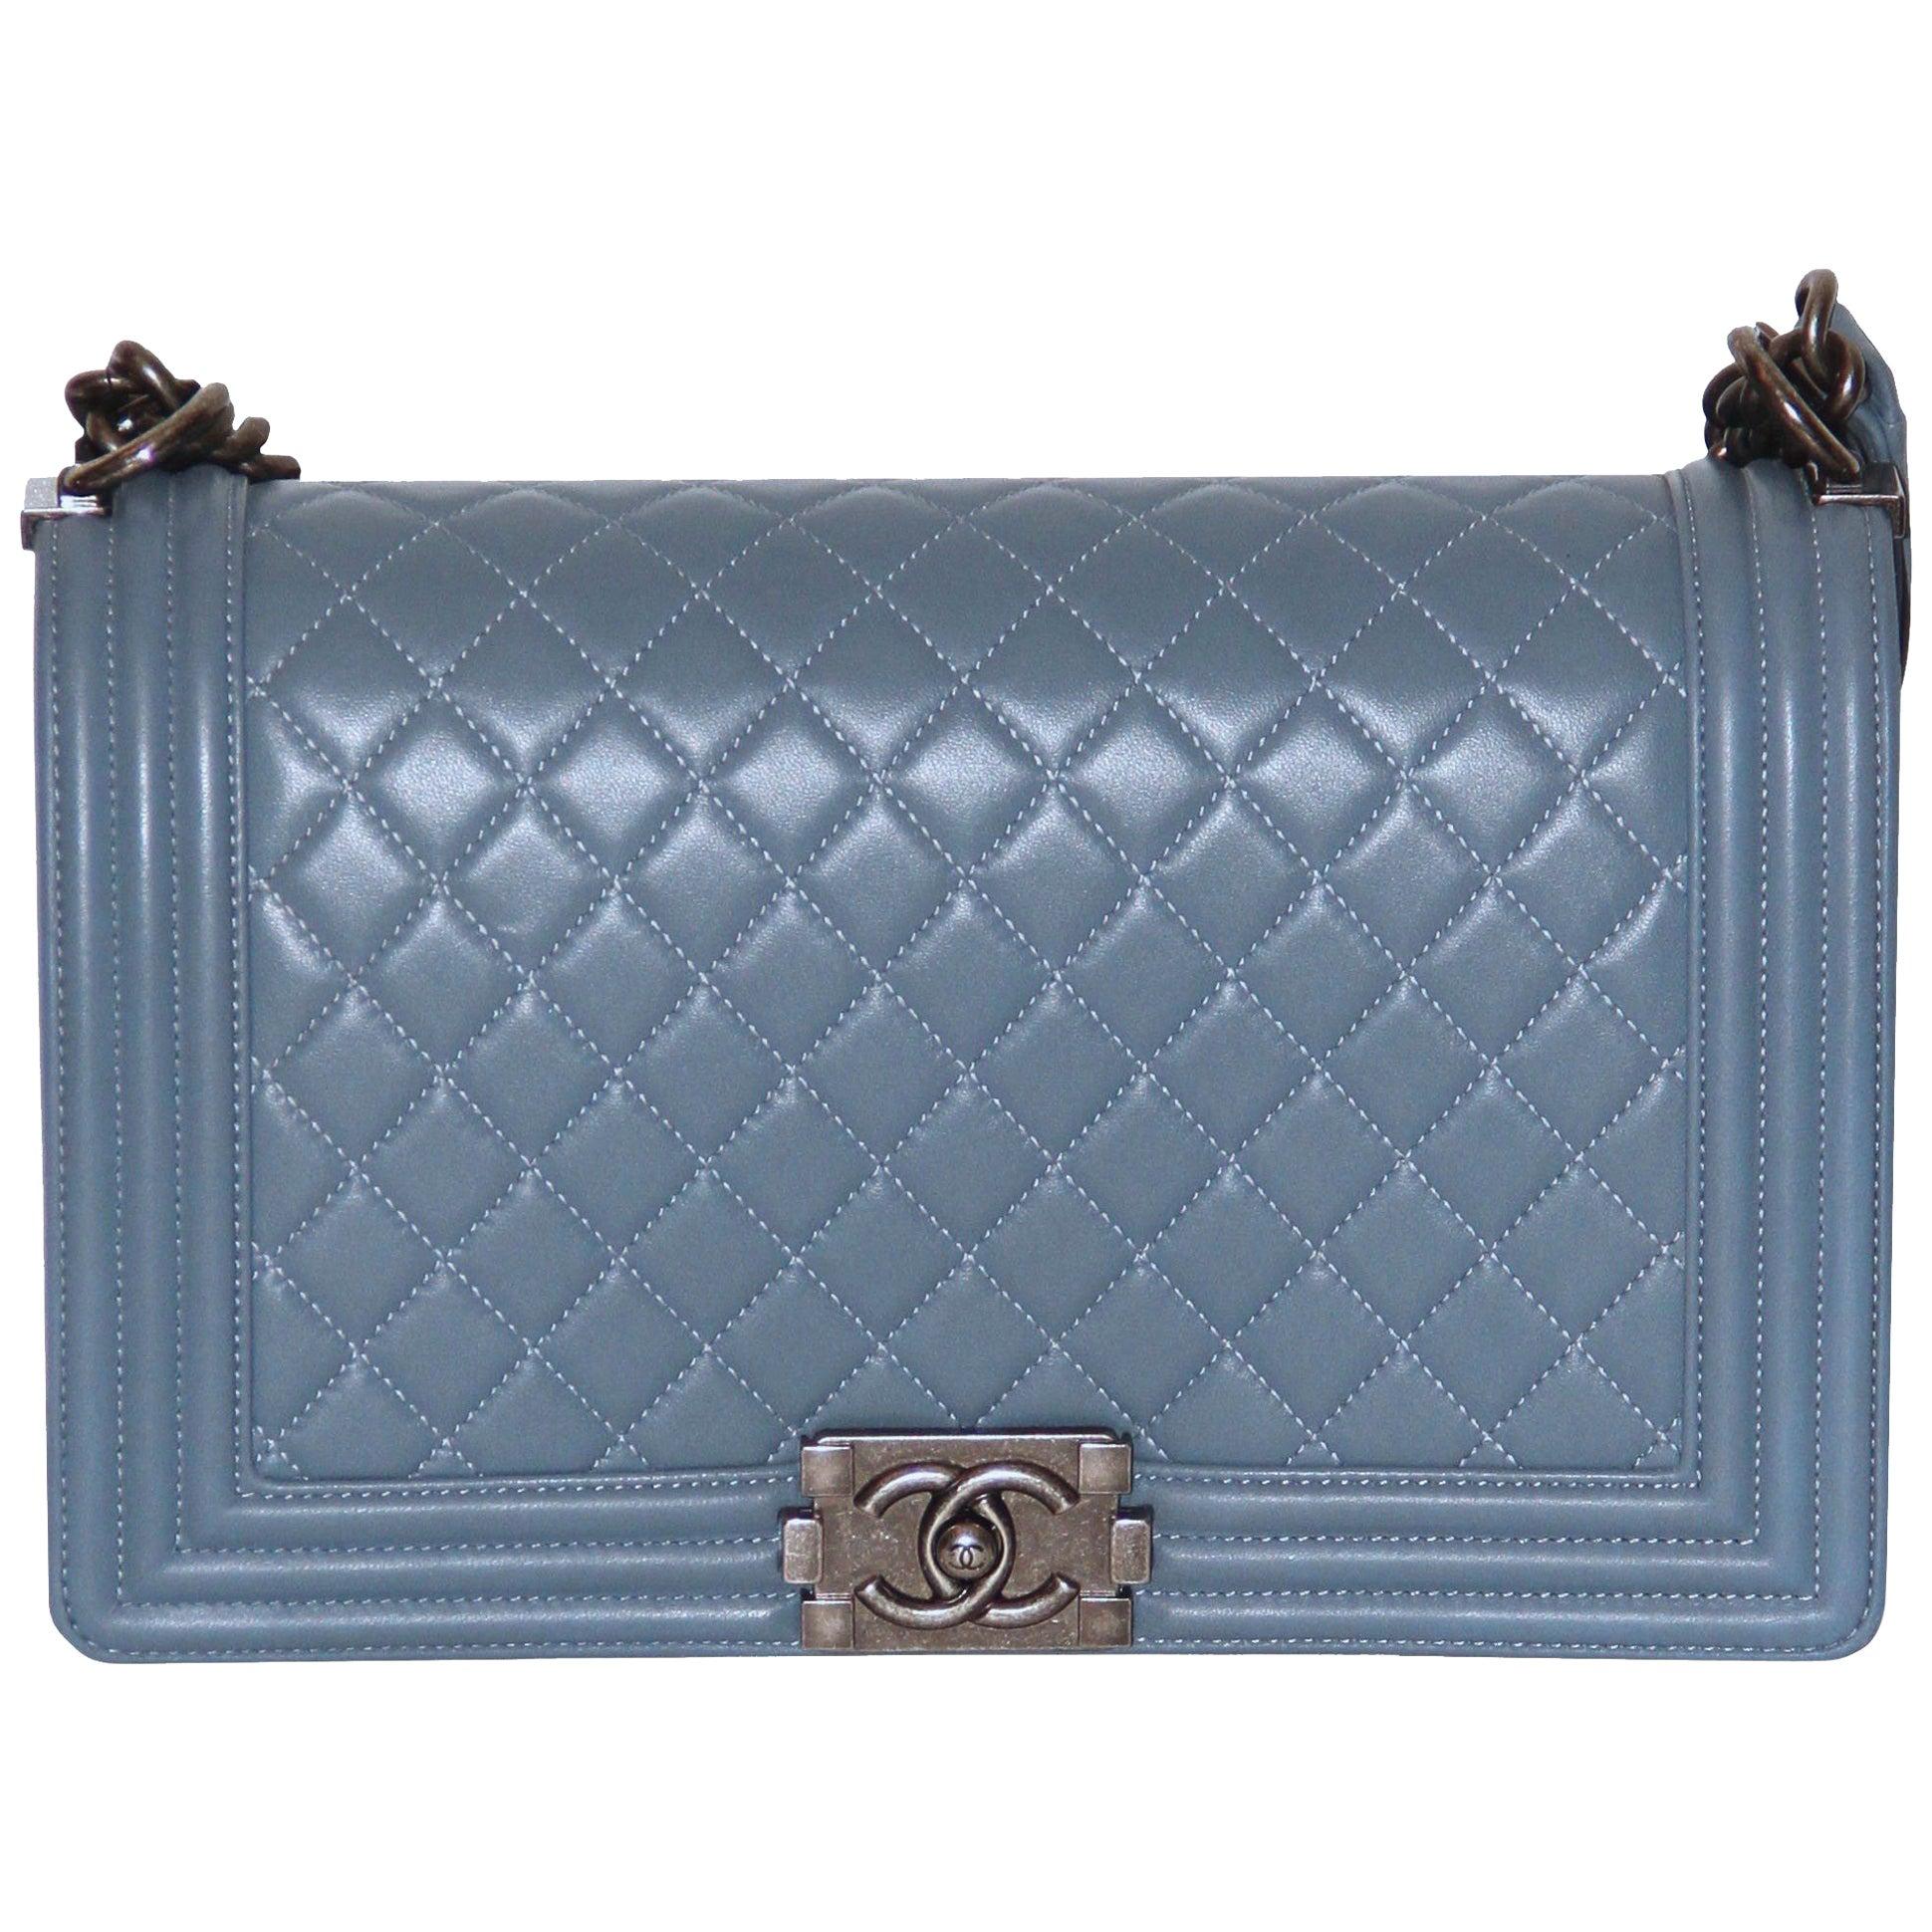 7a952b48a19d Chanel Blue Lambskin Large Boy Bag at 1stdibs